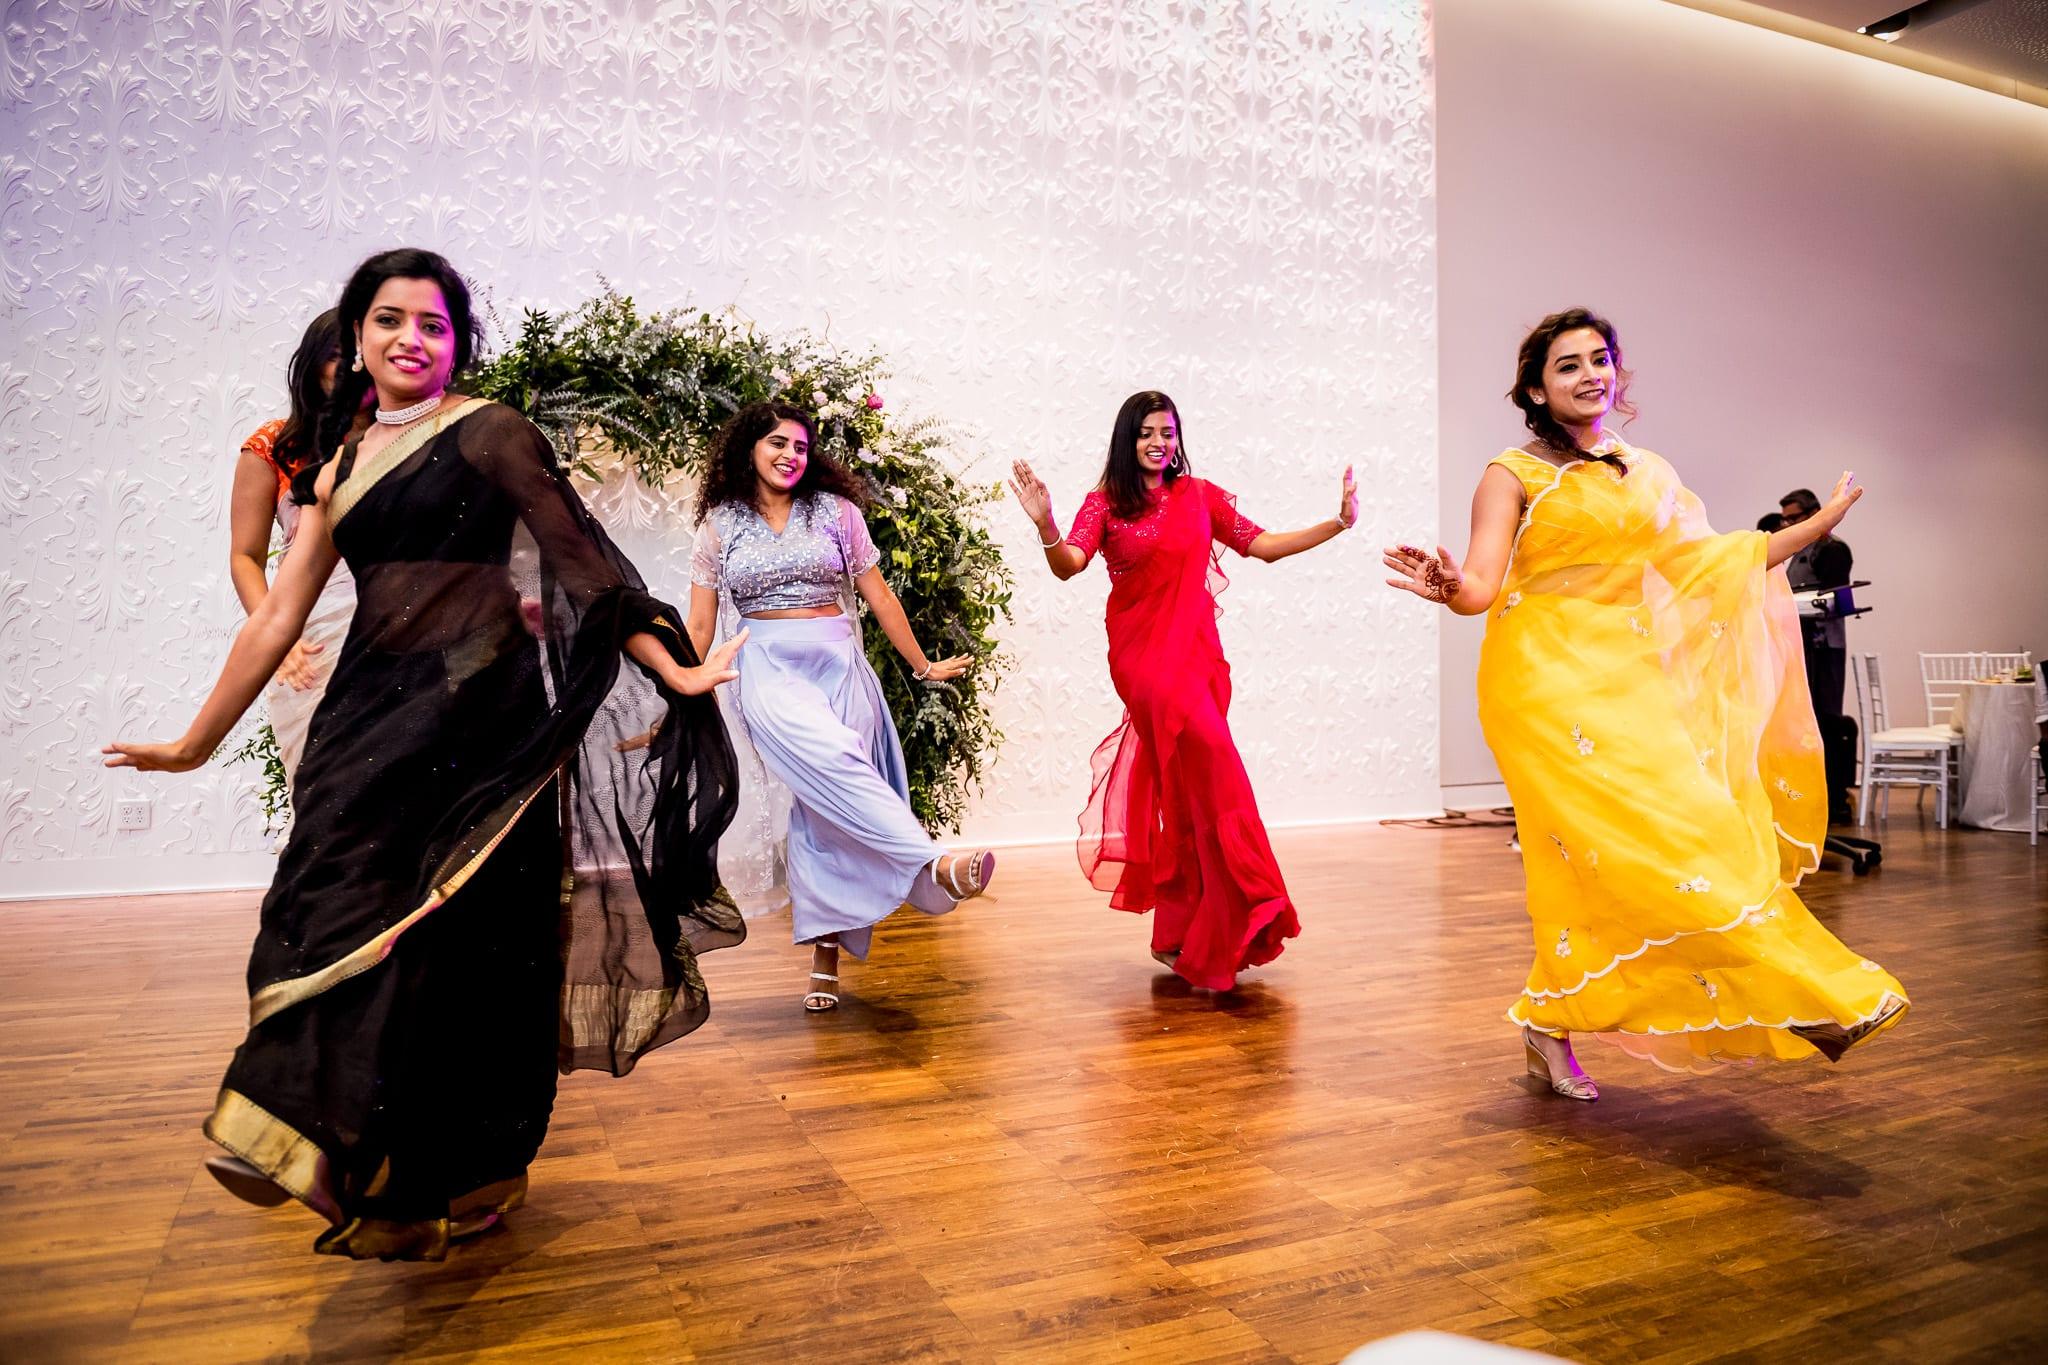 Bridesmaids perform a choreographed dance